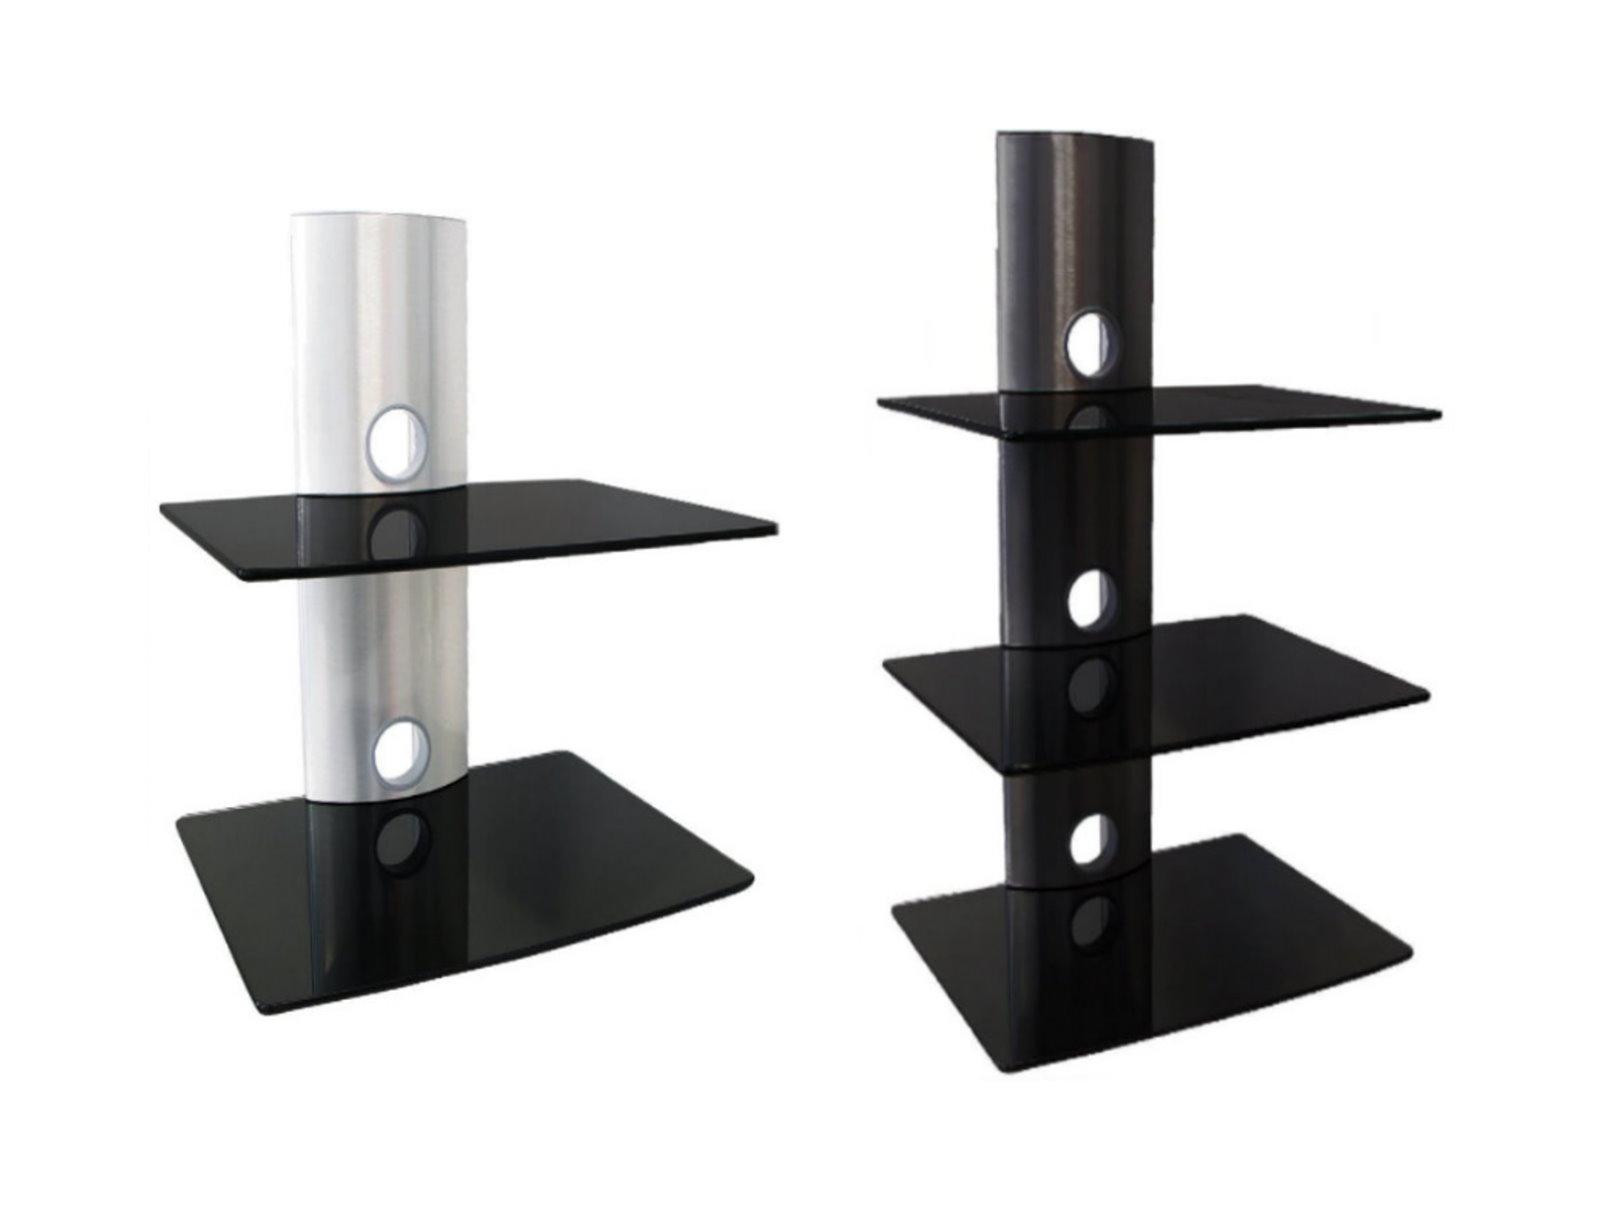 wandregal wandbord regal system wand tv av receiver dvd. Black Bedroom Furniture Sets. Home Design Ideas